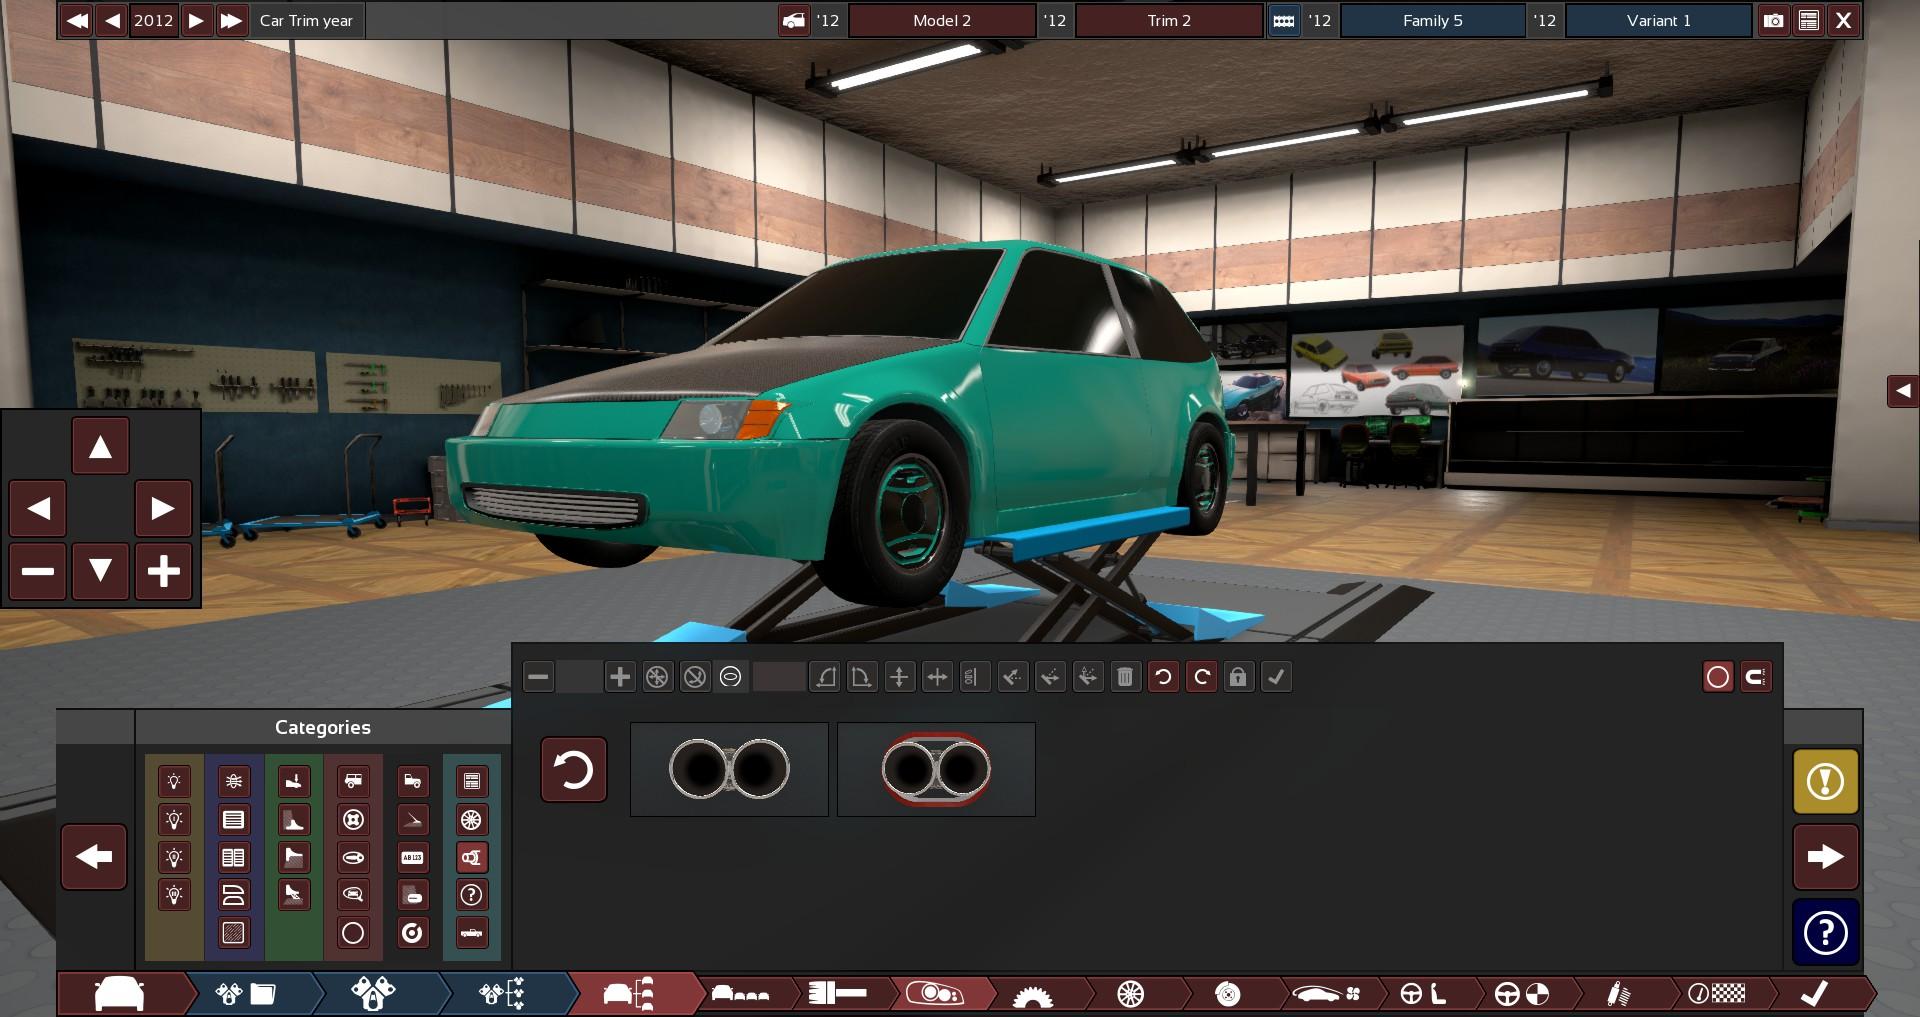 Carbitrage Automation 80s Hatchback Green